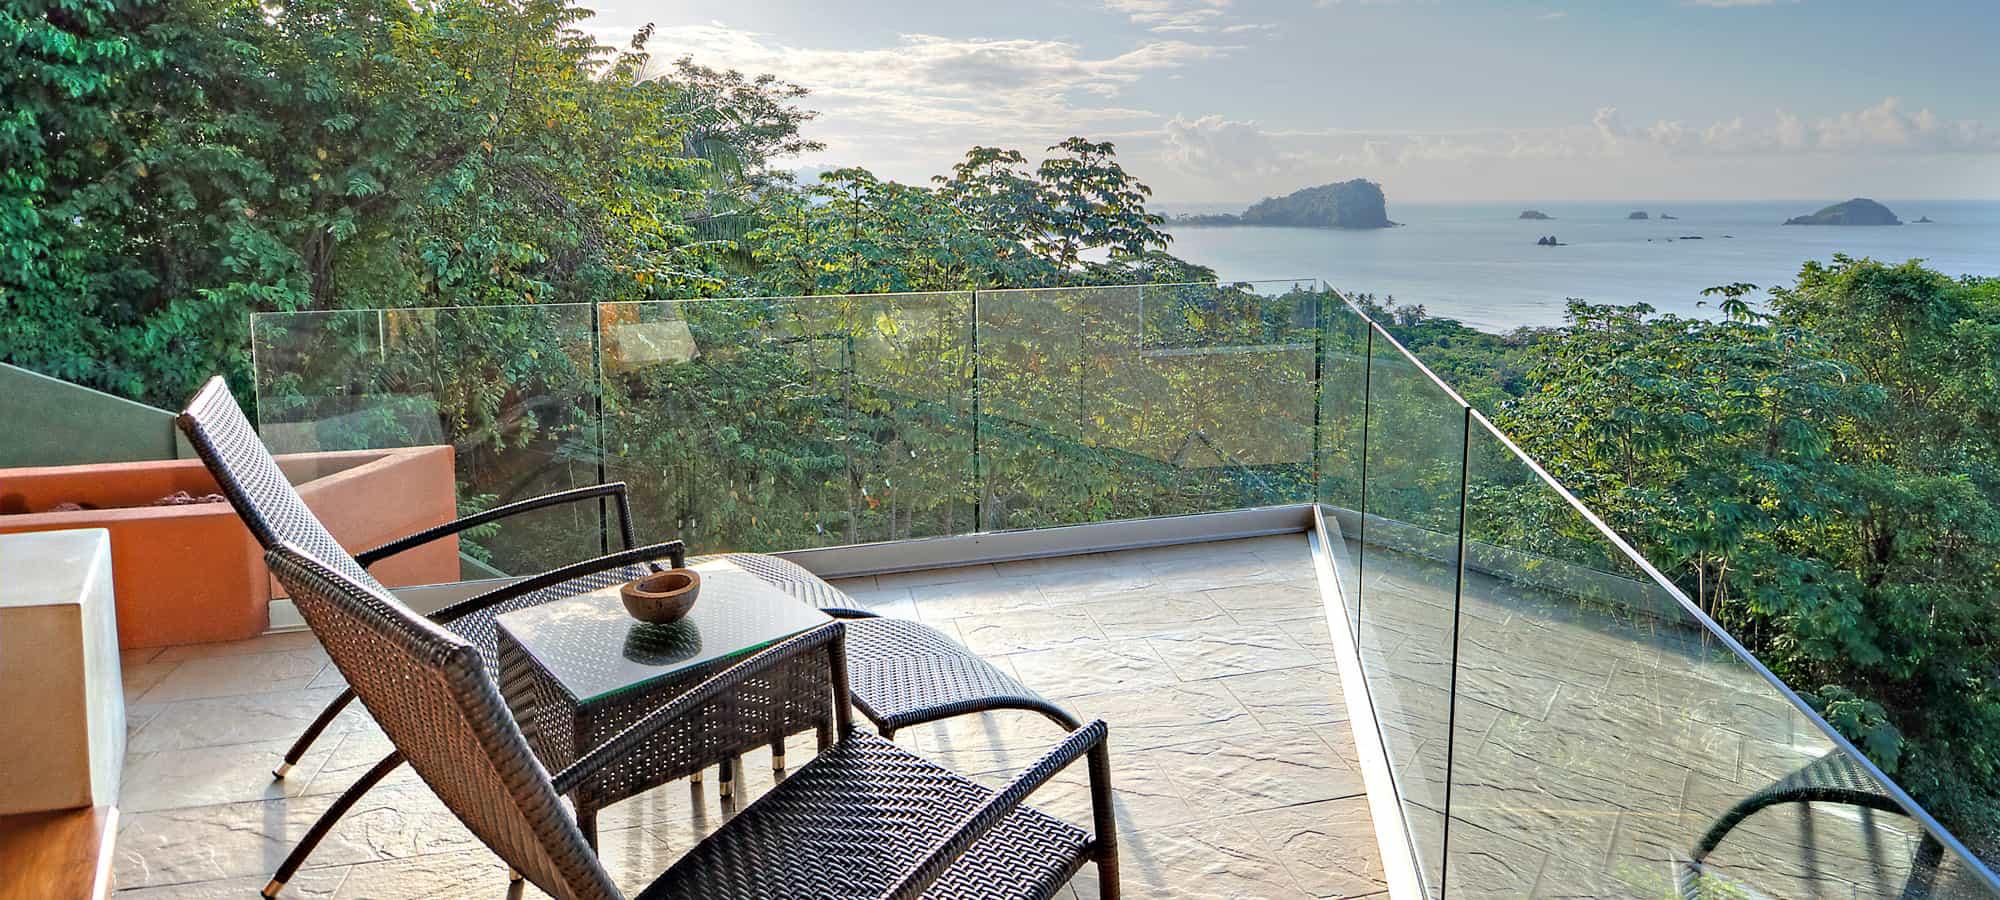 couples retreats in costa rica